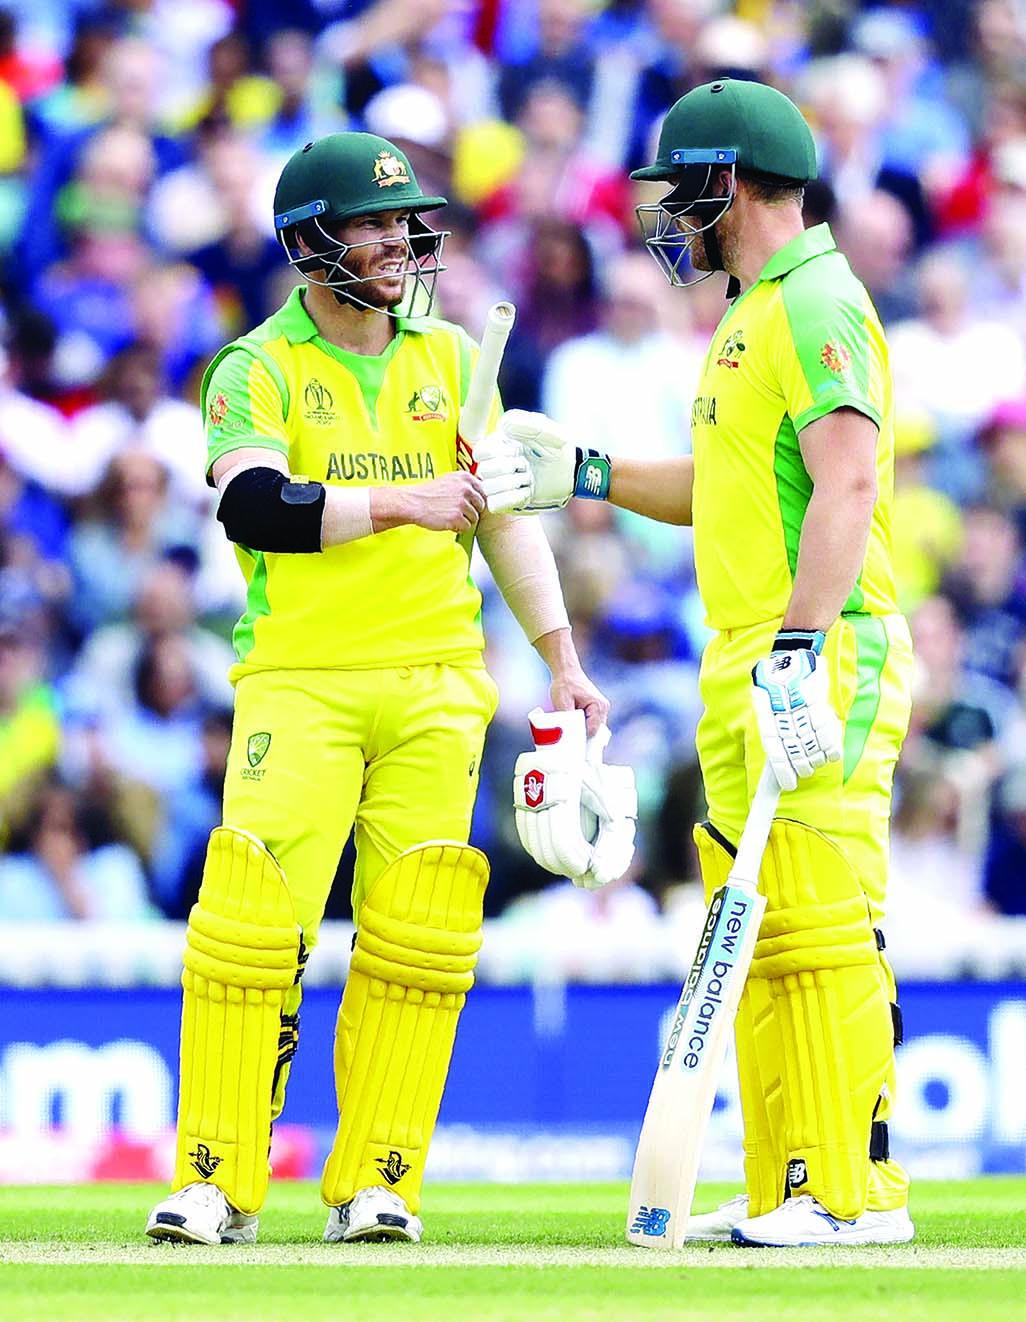 Aussies beat Lanka by 87 runs